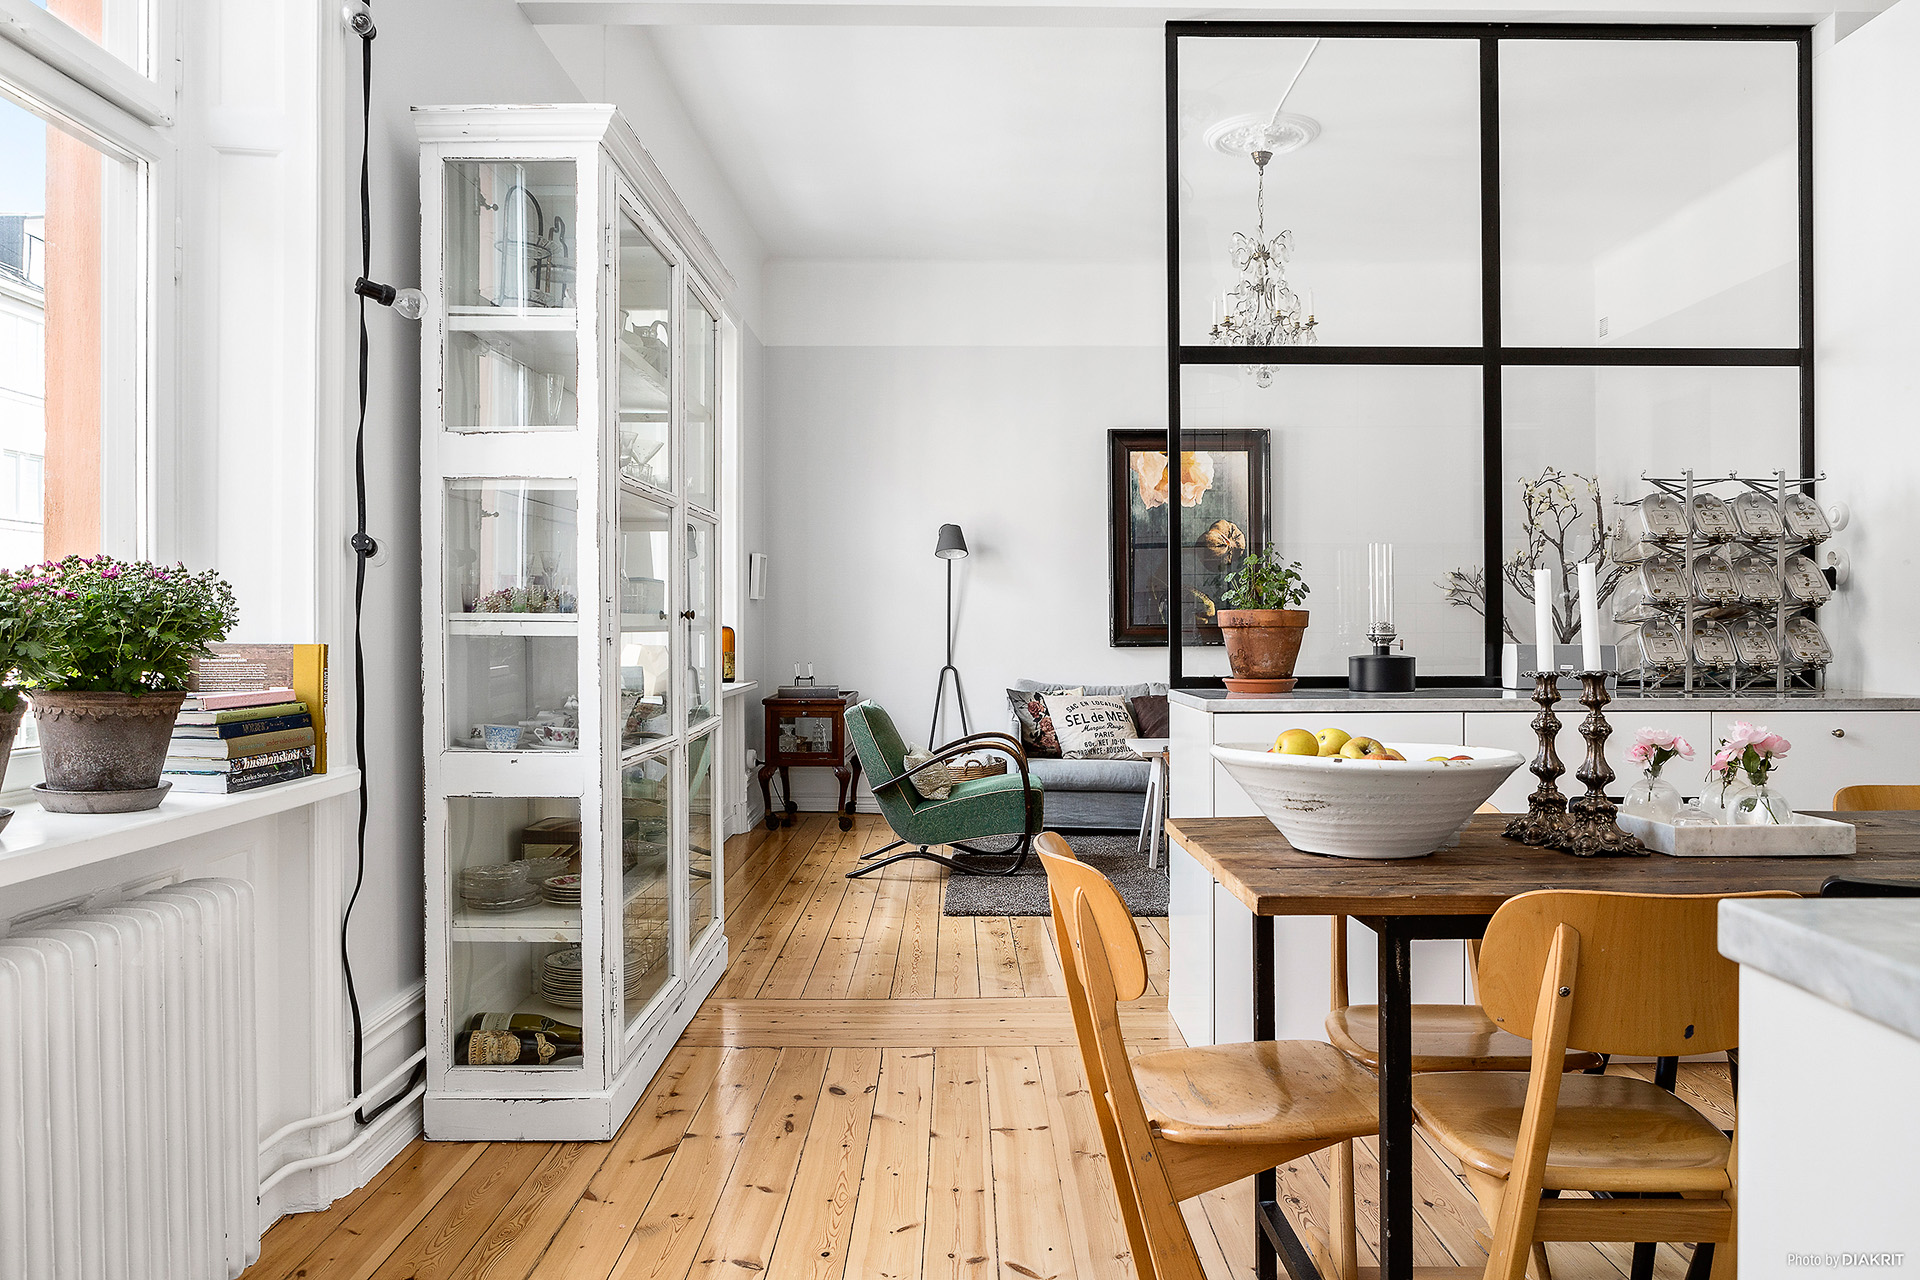 Incluir cristaleras para crear espacios interiores chic - Cocina salon separados cristal ...